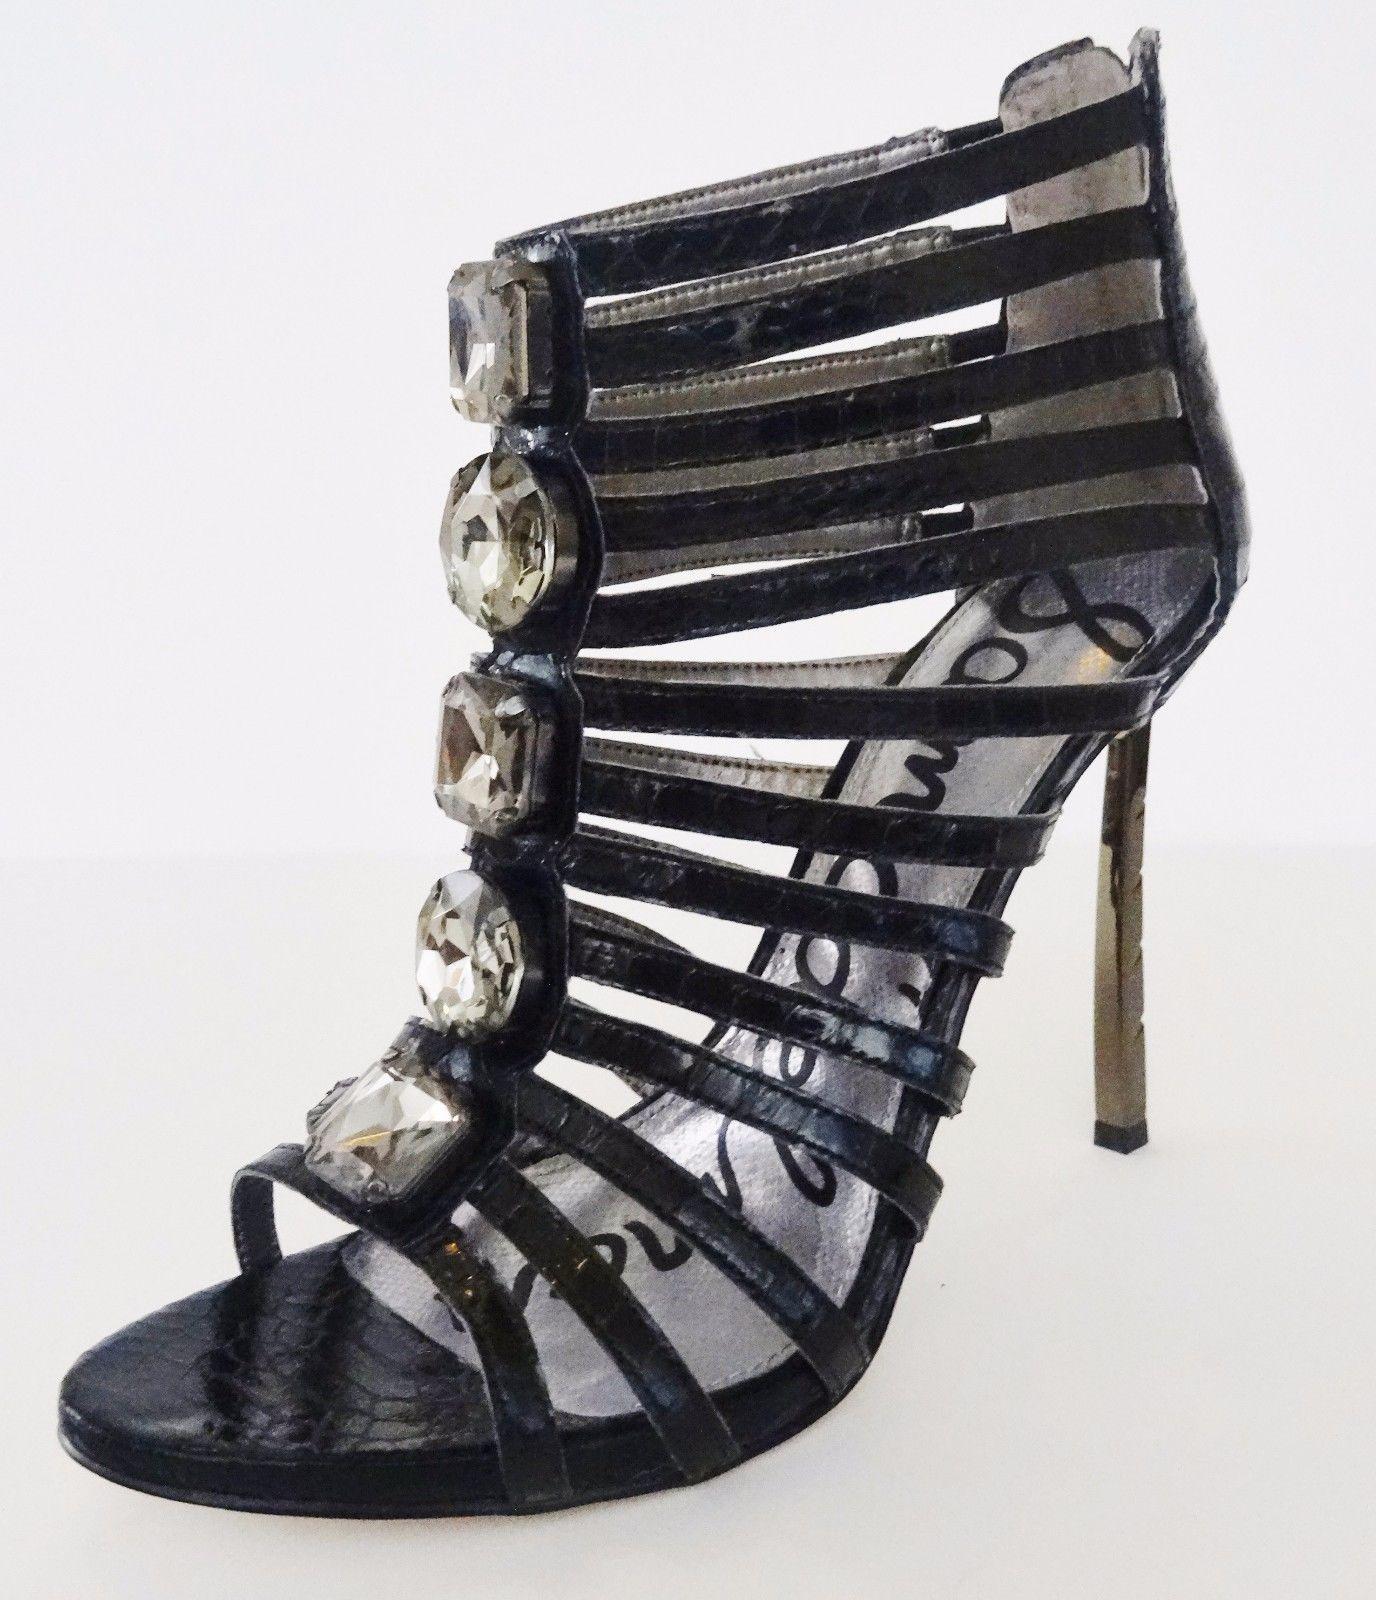 868f6517dba42 NIB Sam Edelman Hampton Ankle Caged Sandal and 33 similar items. S l1600